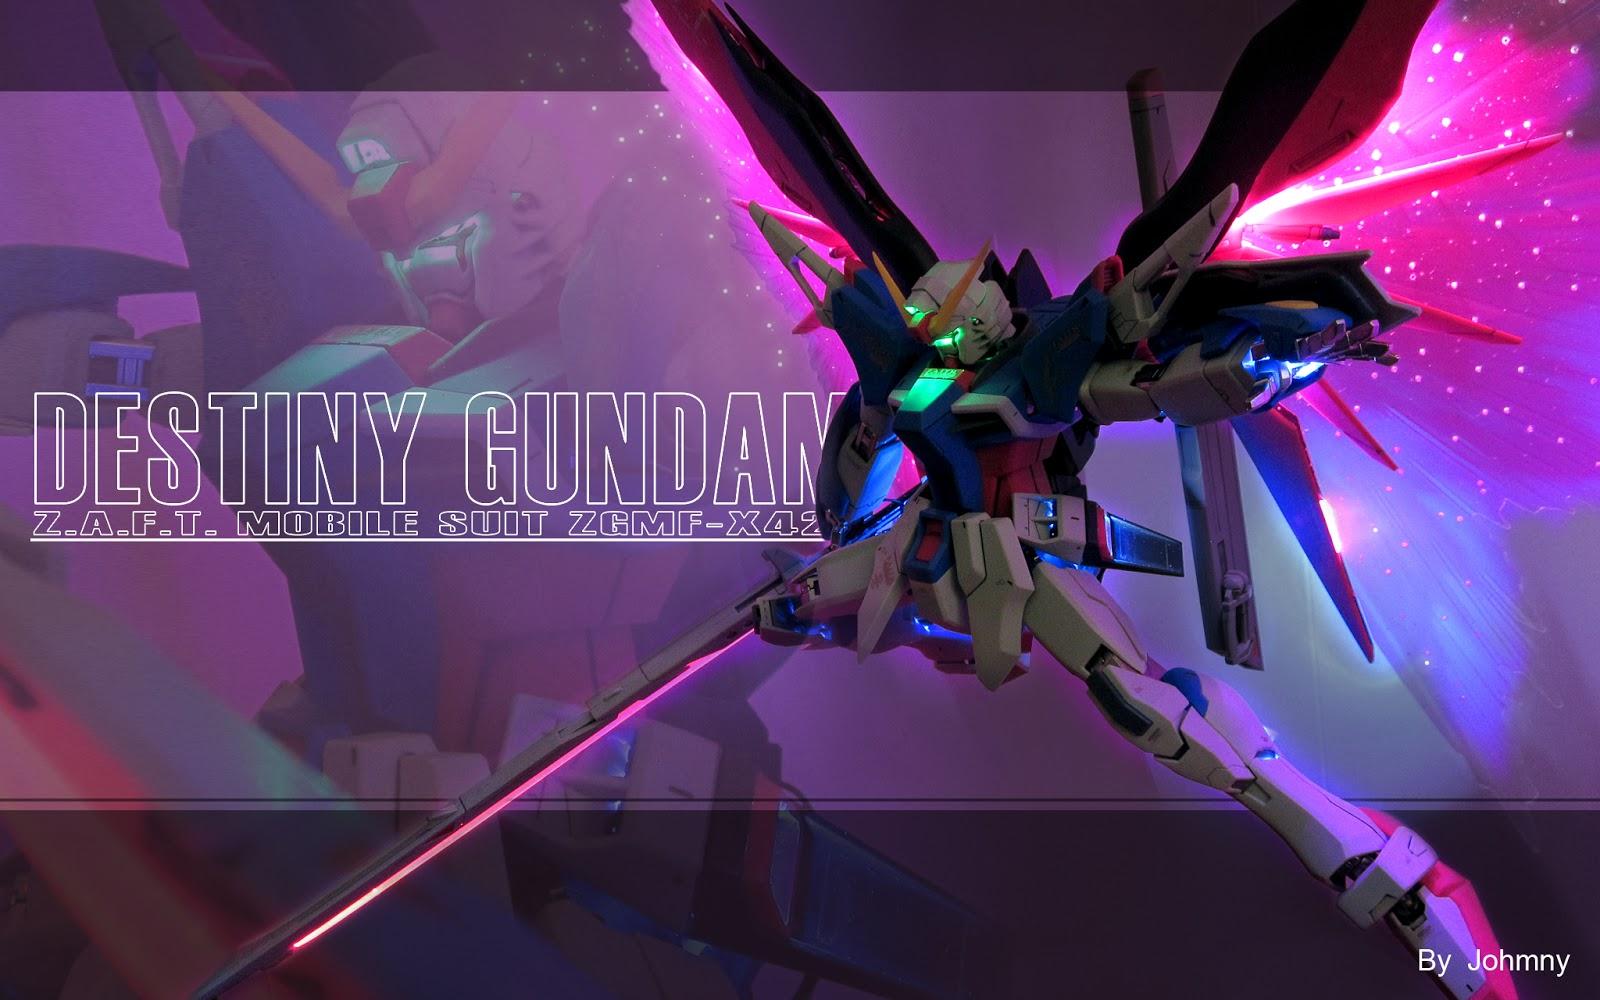 gundam guy mg 1 100 destiny gundam custom build w led. Black Bedroom Furniture Sets. Home Design Ideas